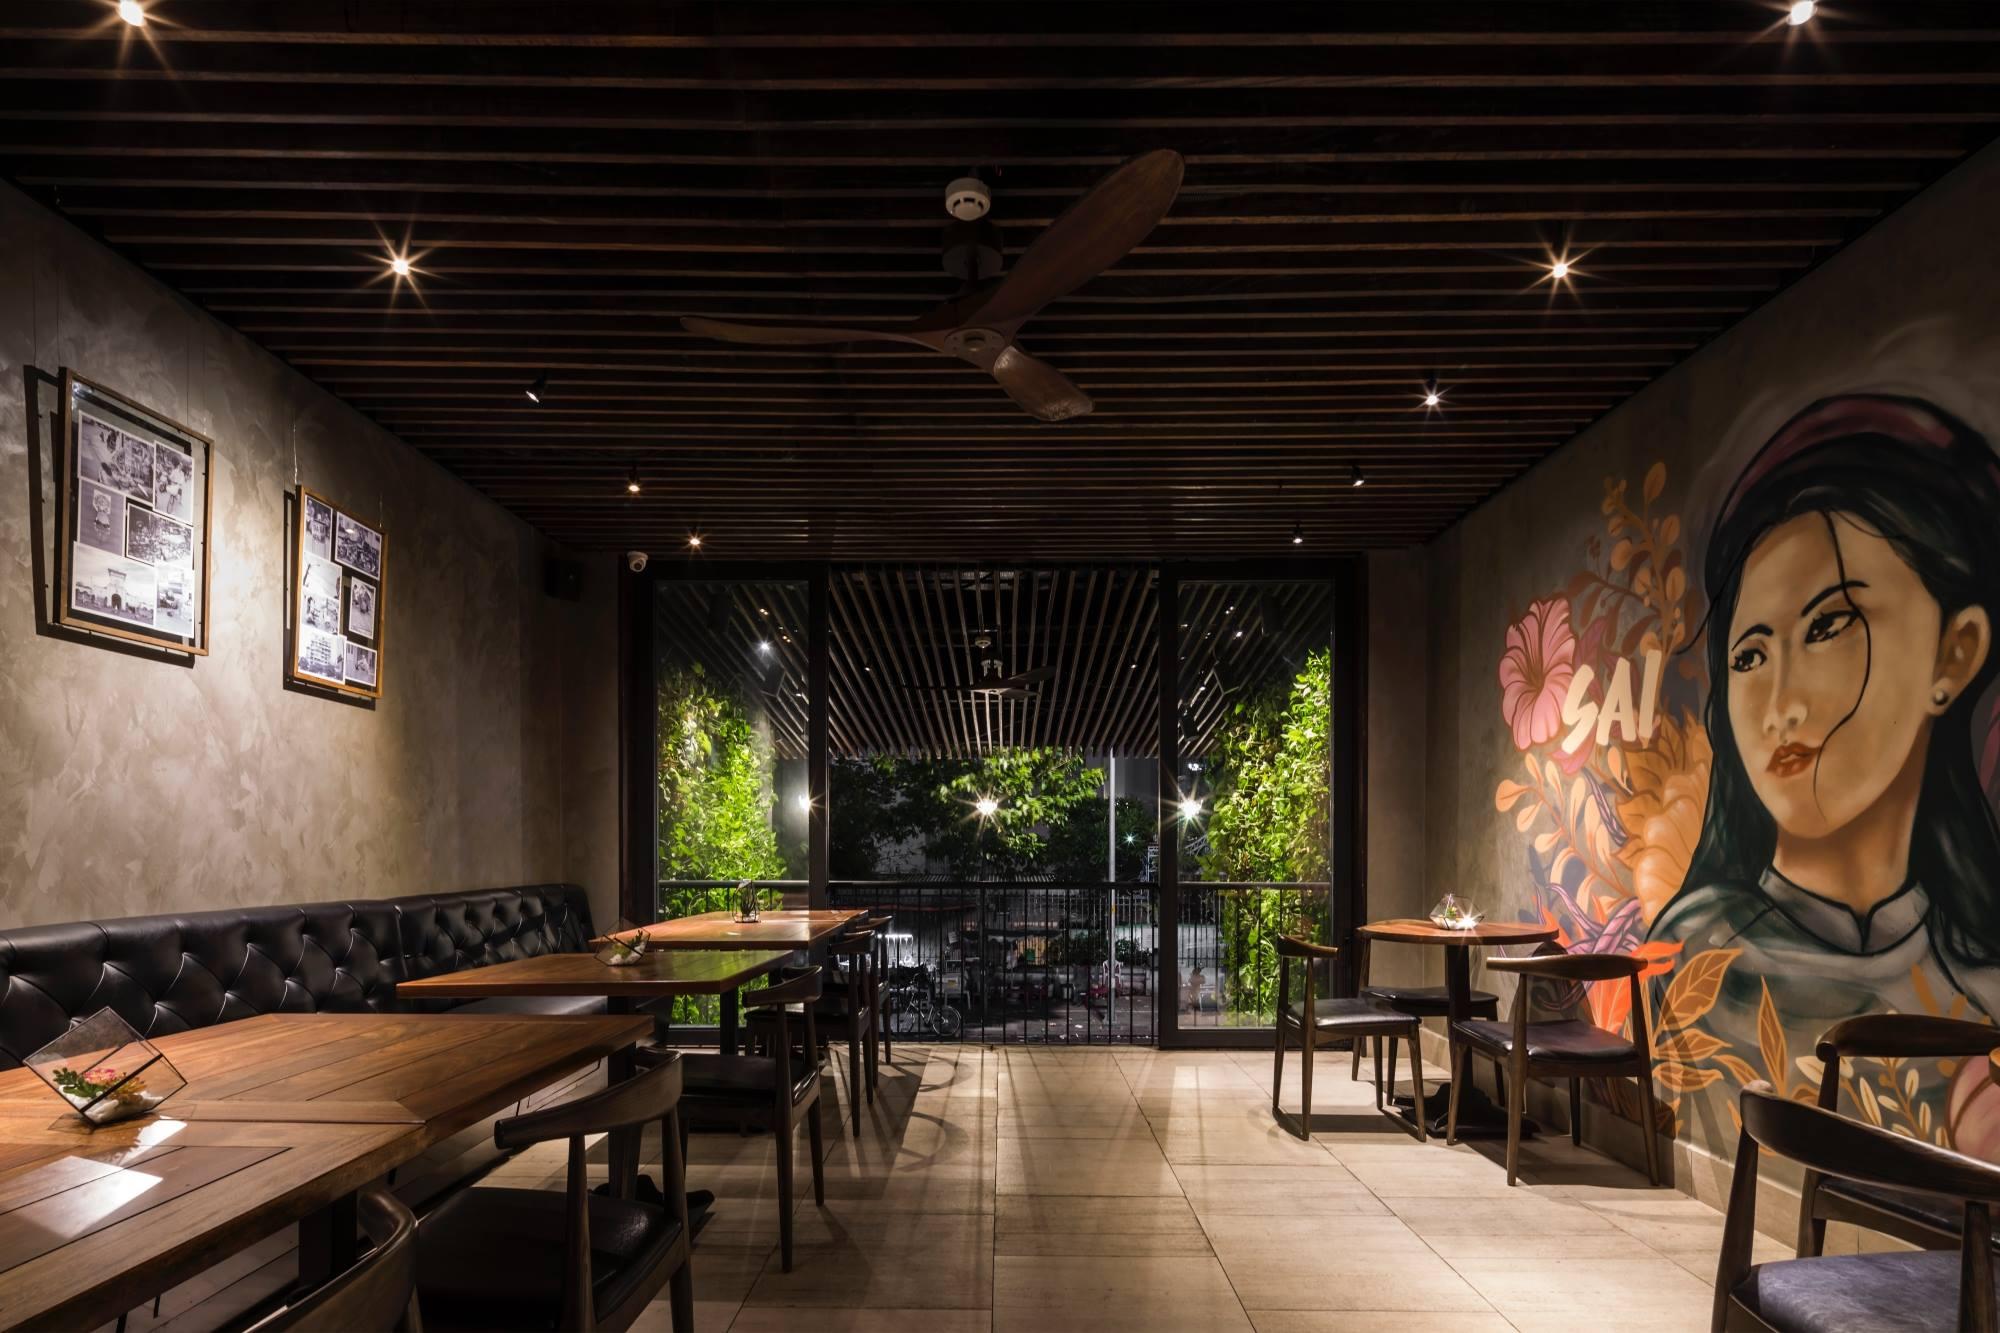 Saigon-fusion-kitchen-bar-1